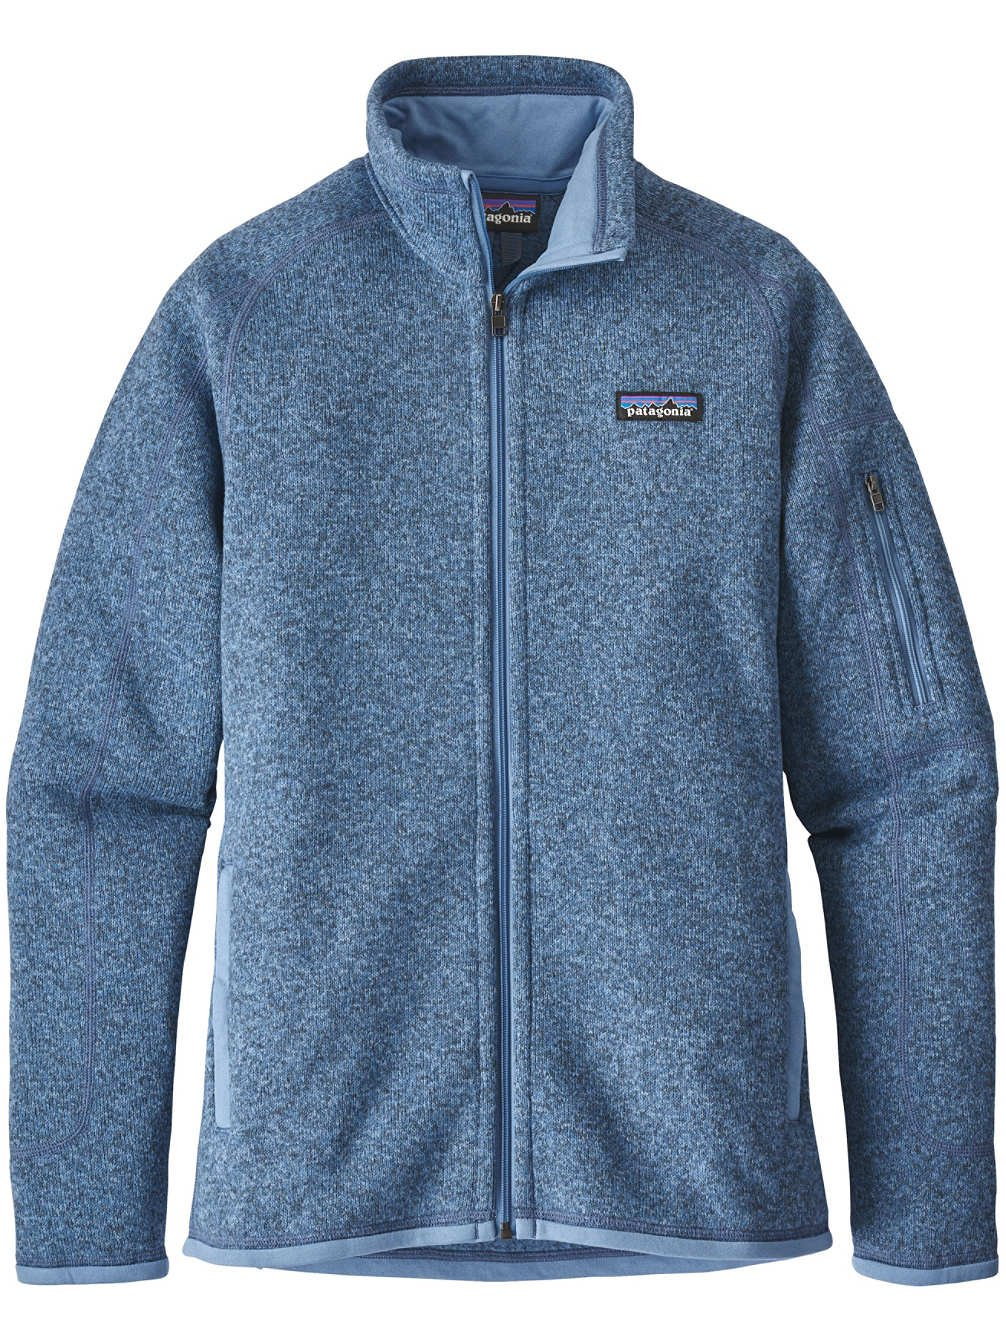 Patagonia Women's Better Sweater Jacket Railroad Blue (Medium, Railroad Blue) by Patagonia